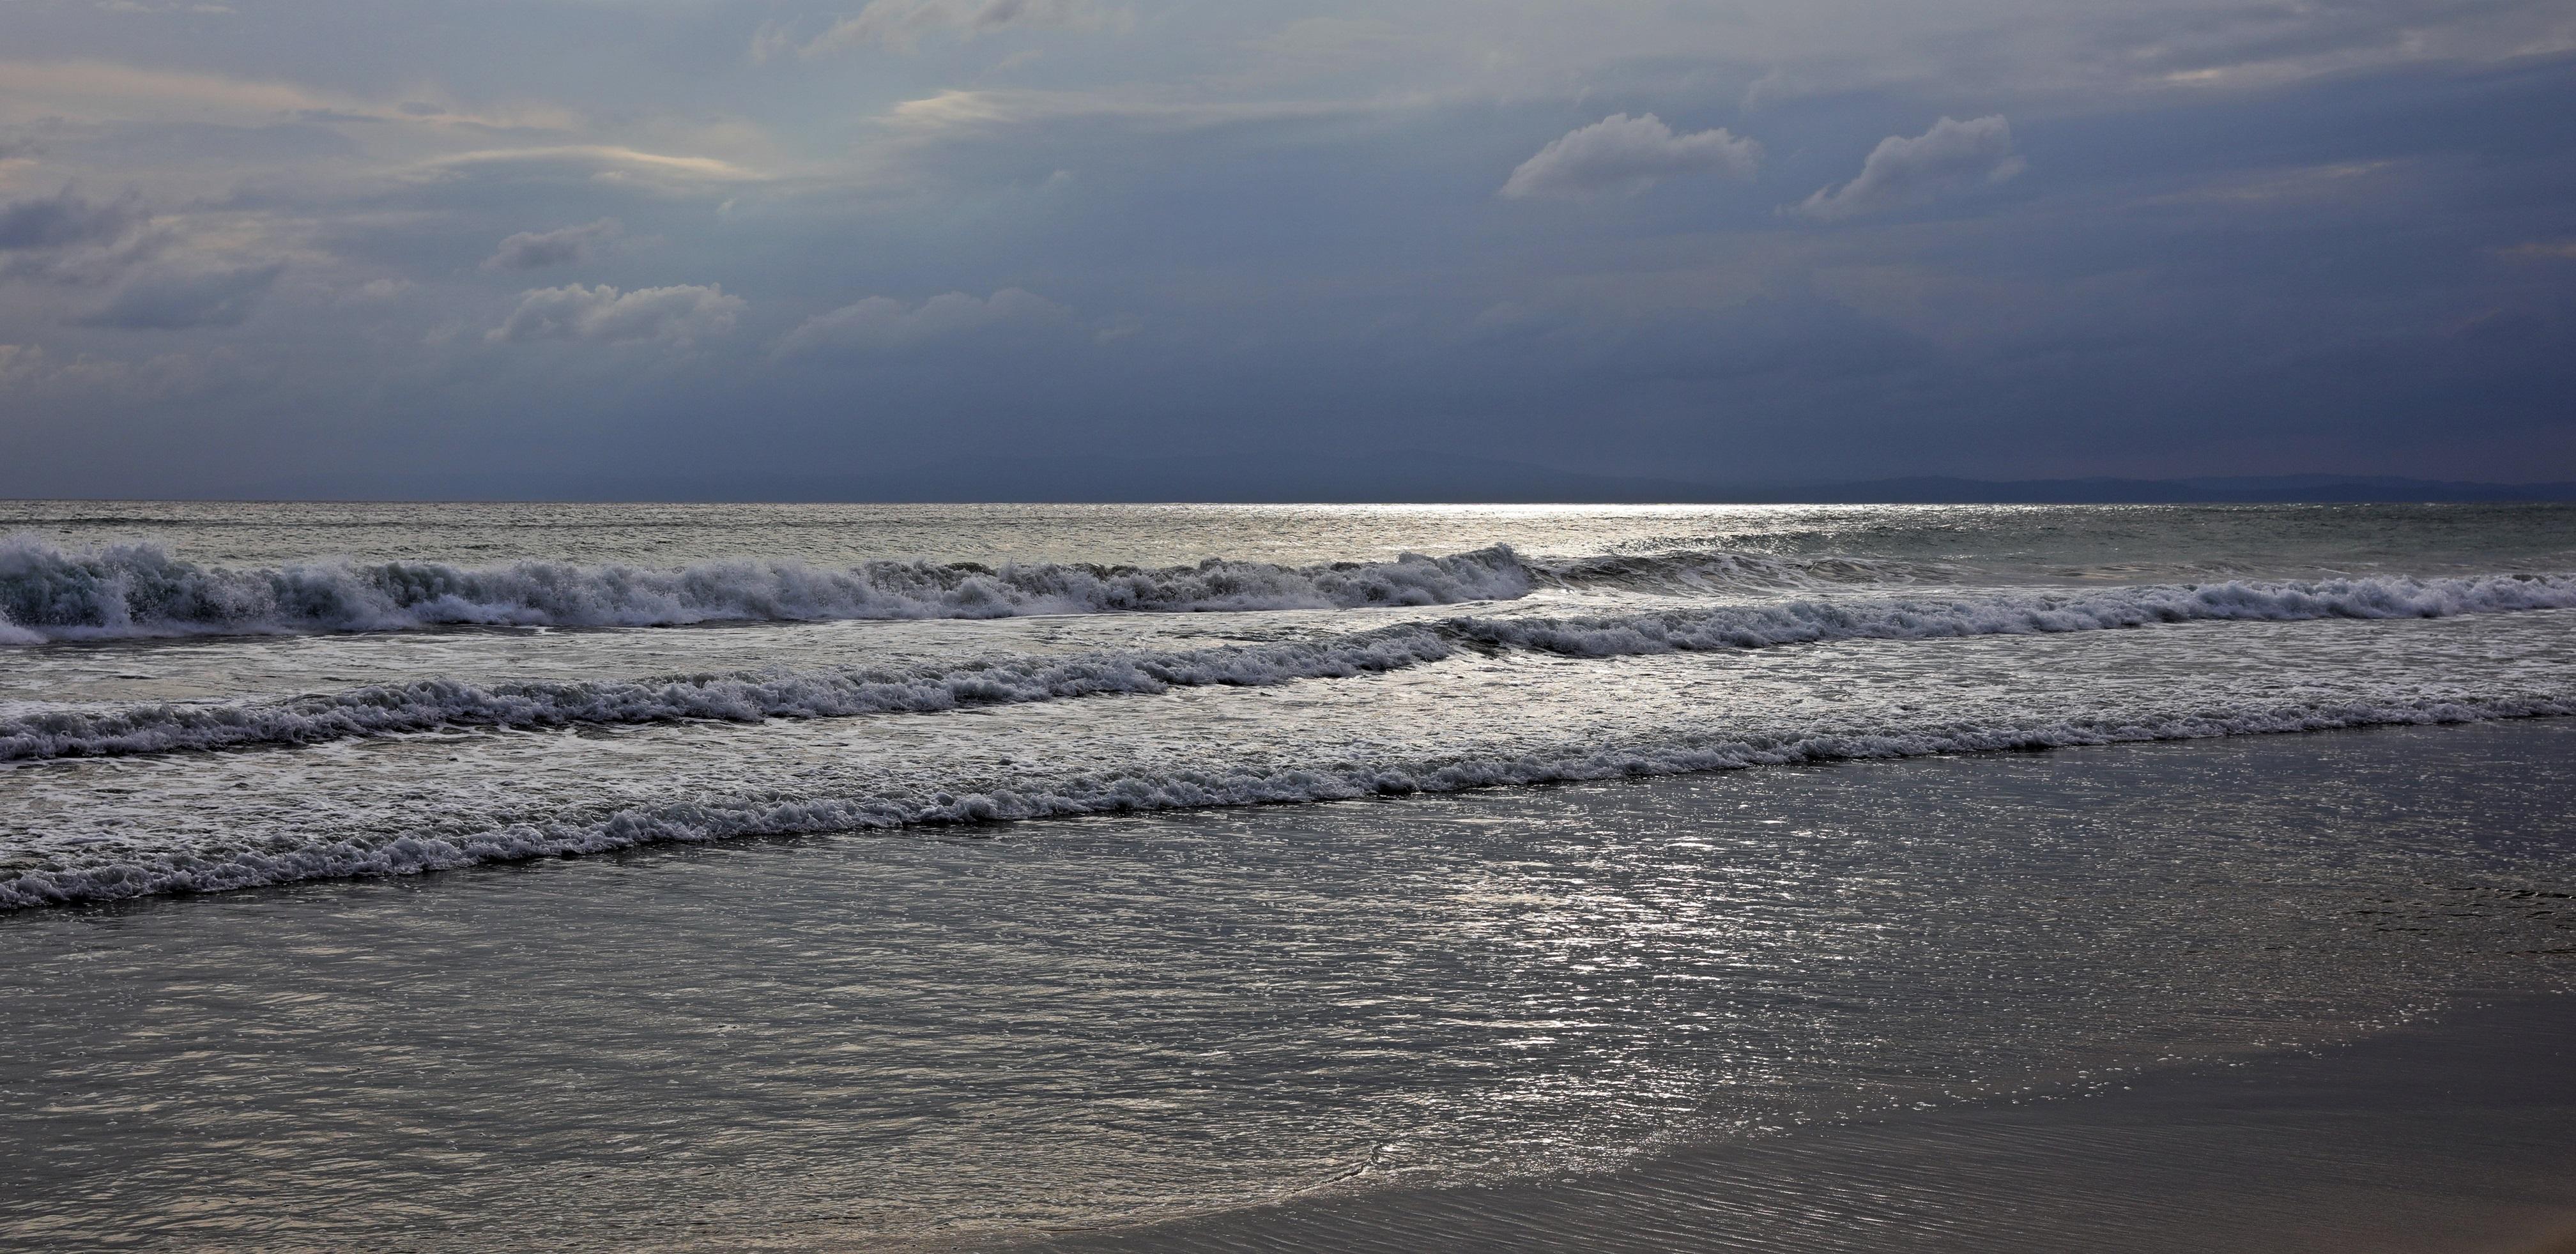 Storm coming in on Radhanaga Beach, Havelock Island